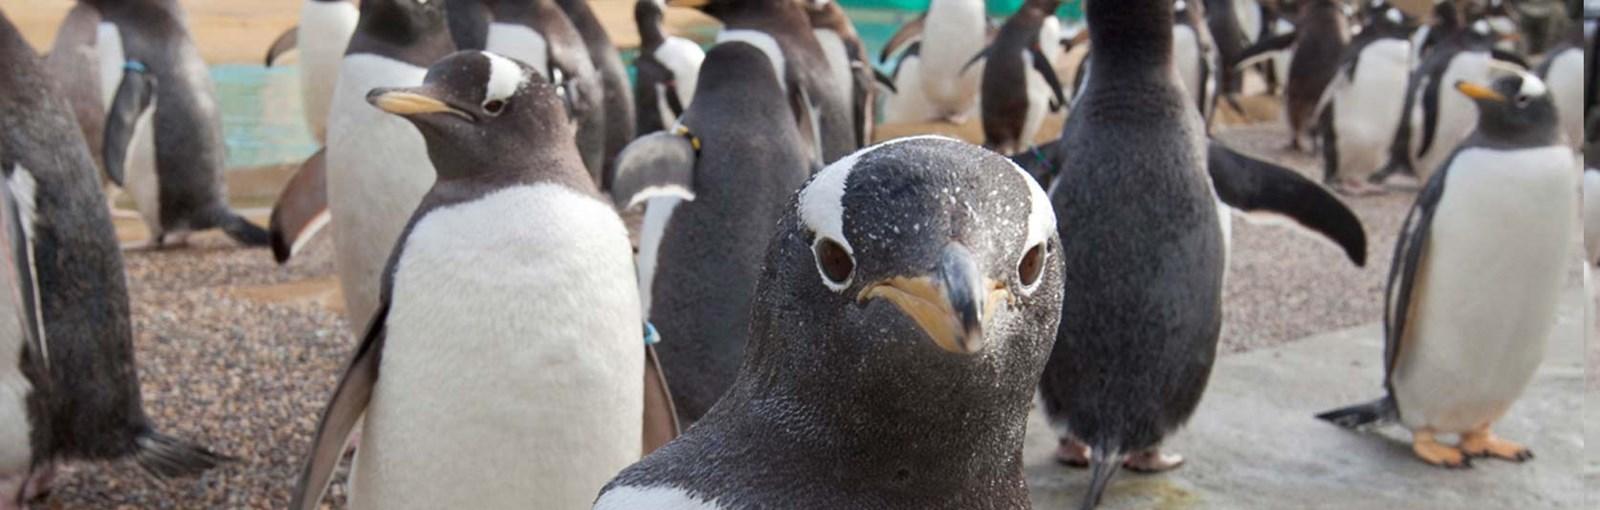 gentoo penguin habitat